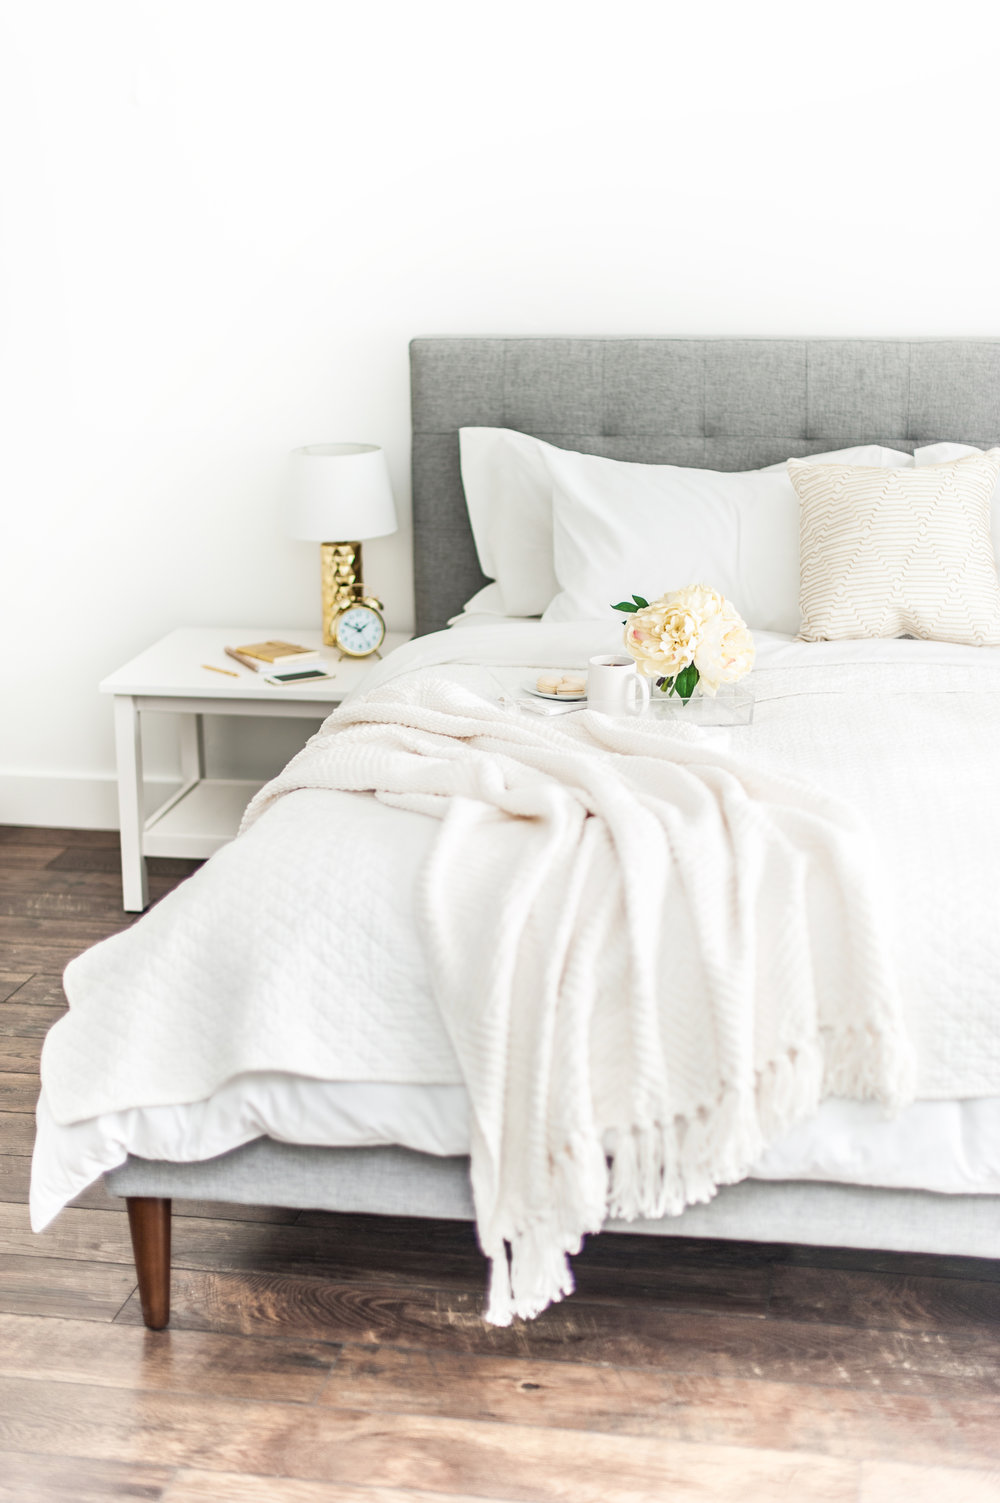 kate max interior bed.jpg